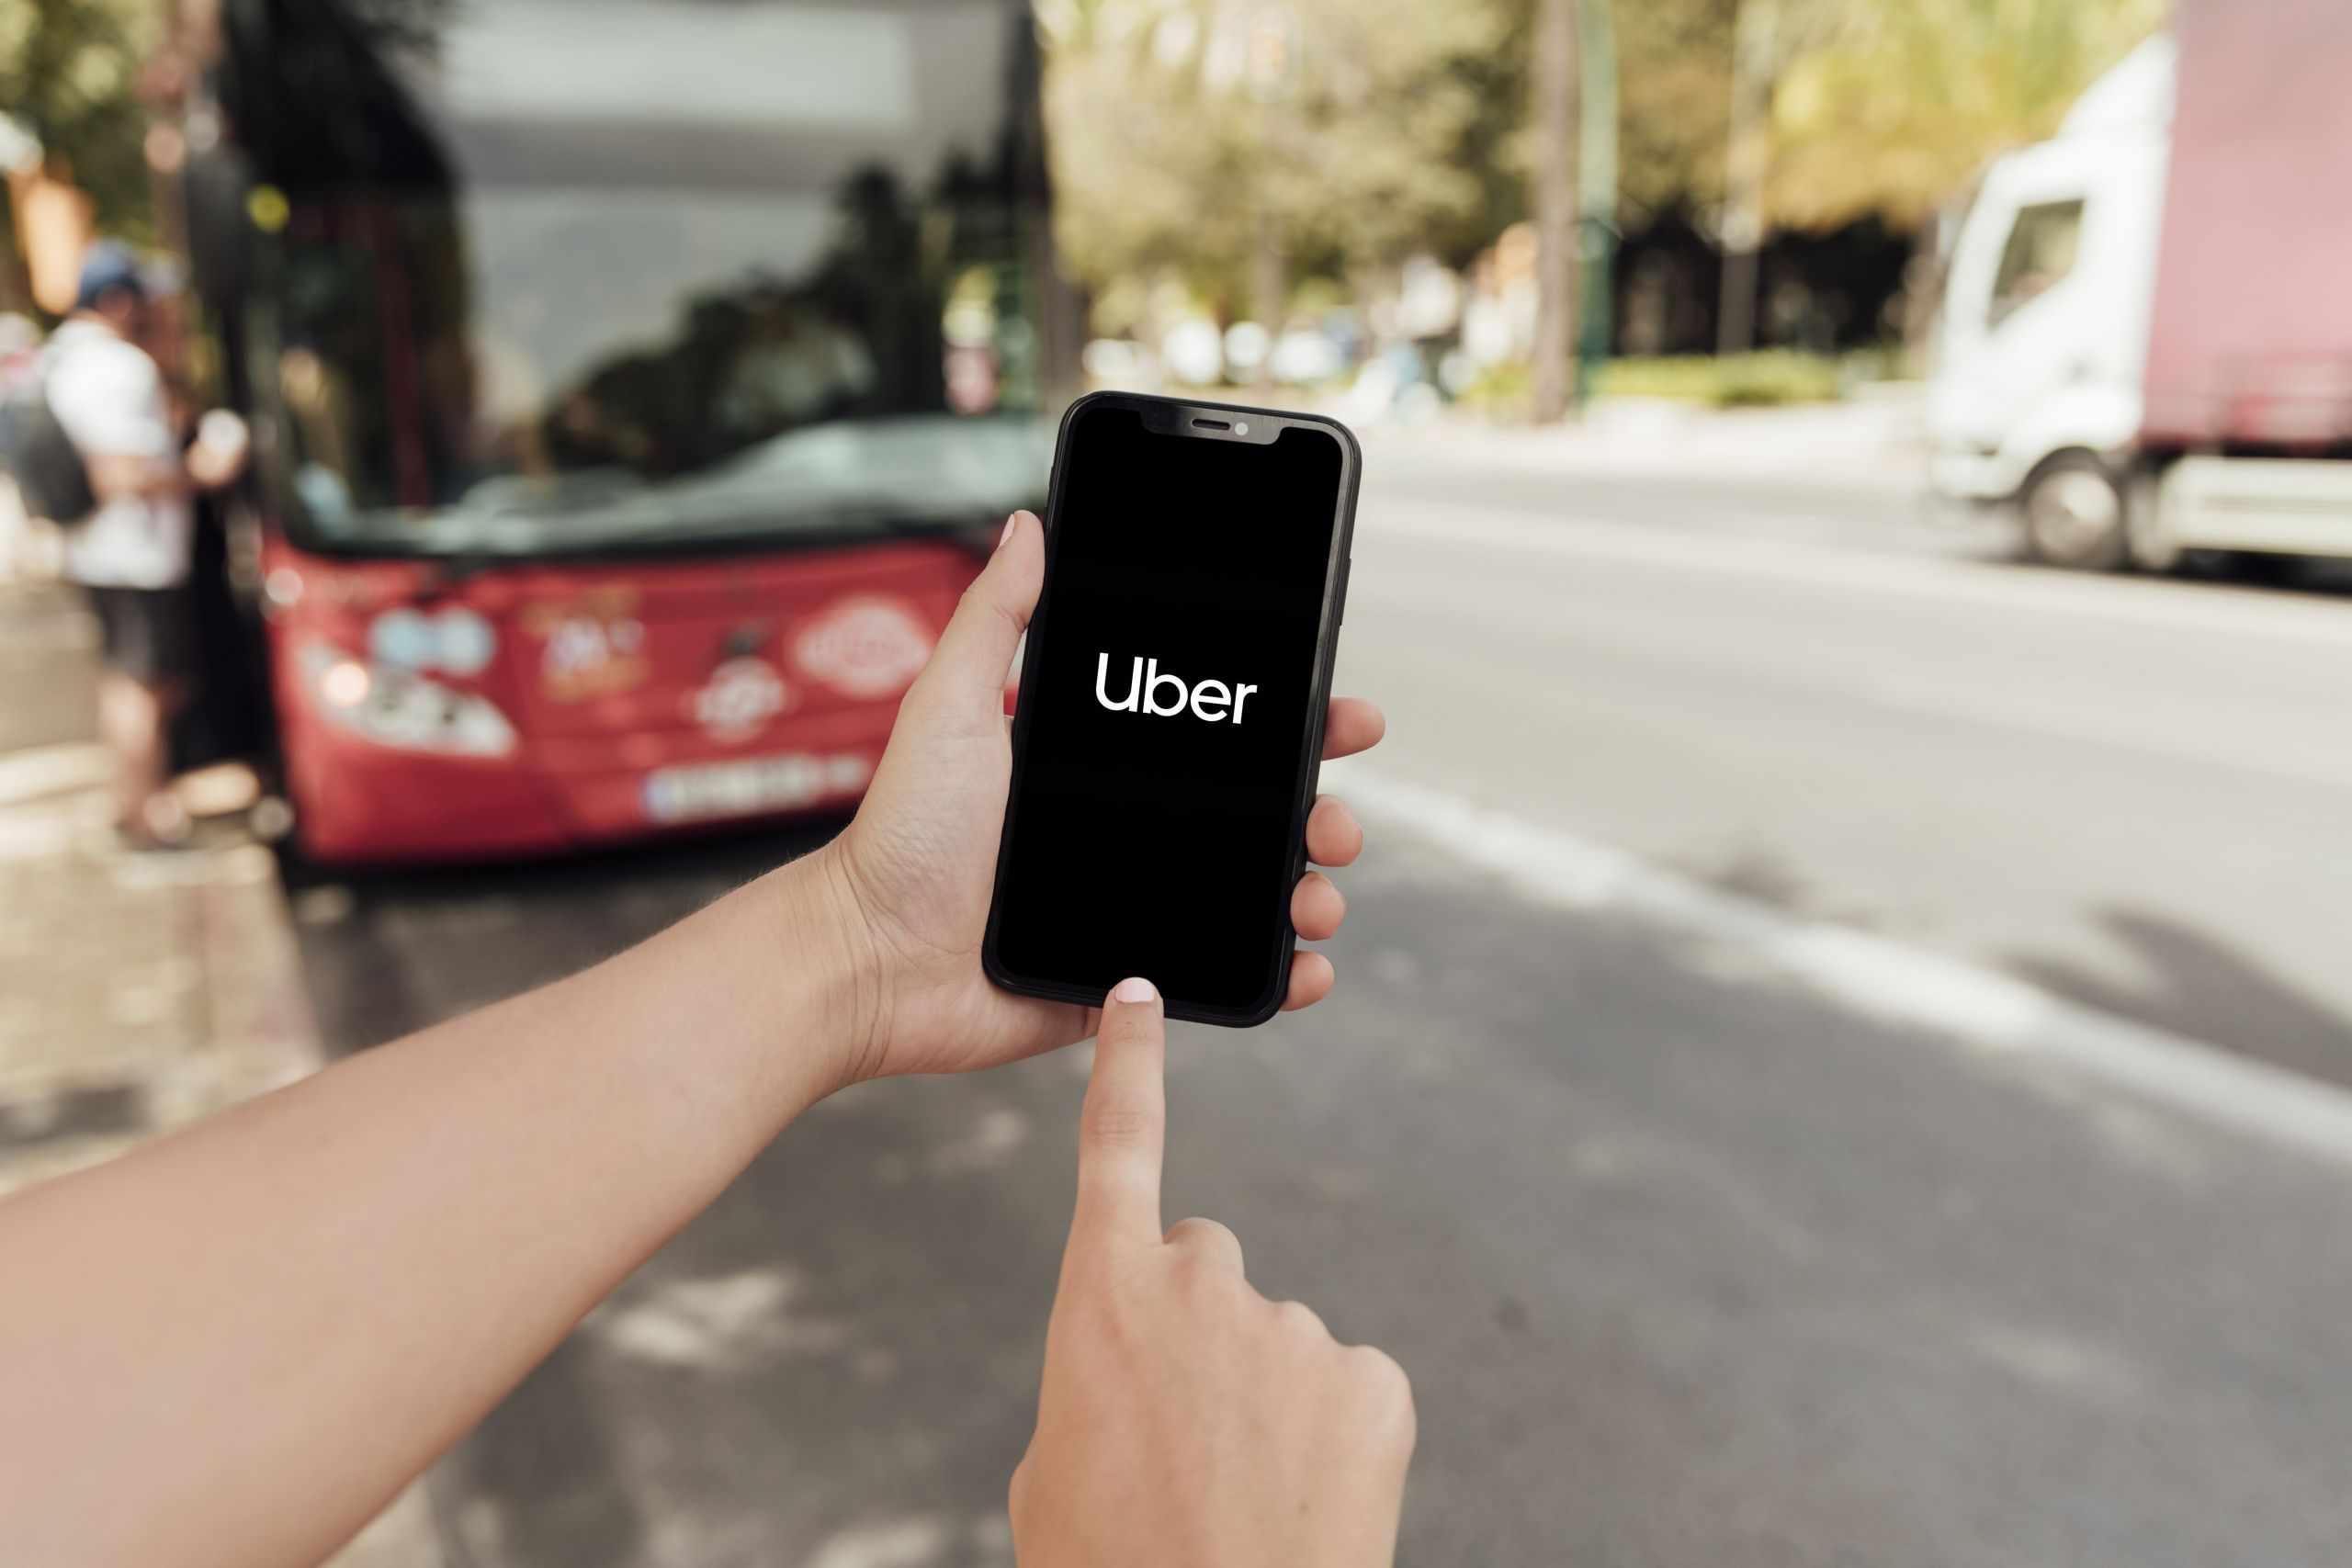 Uber ride sharing